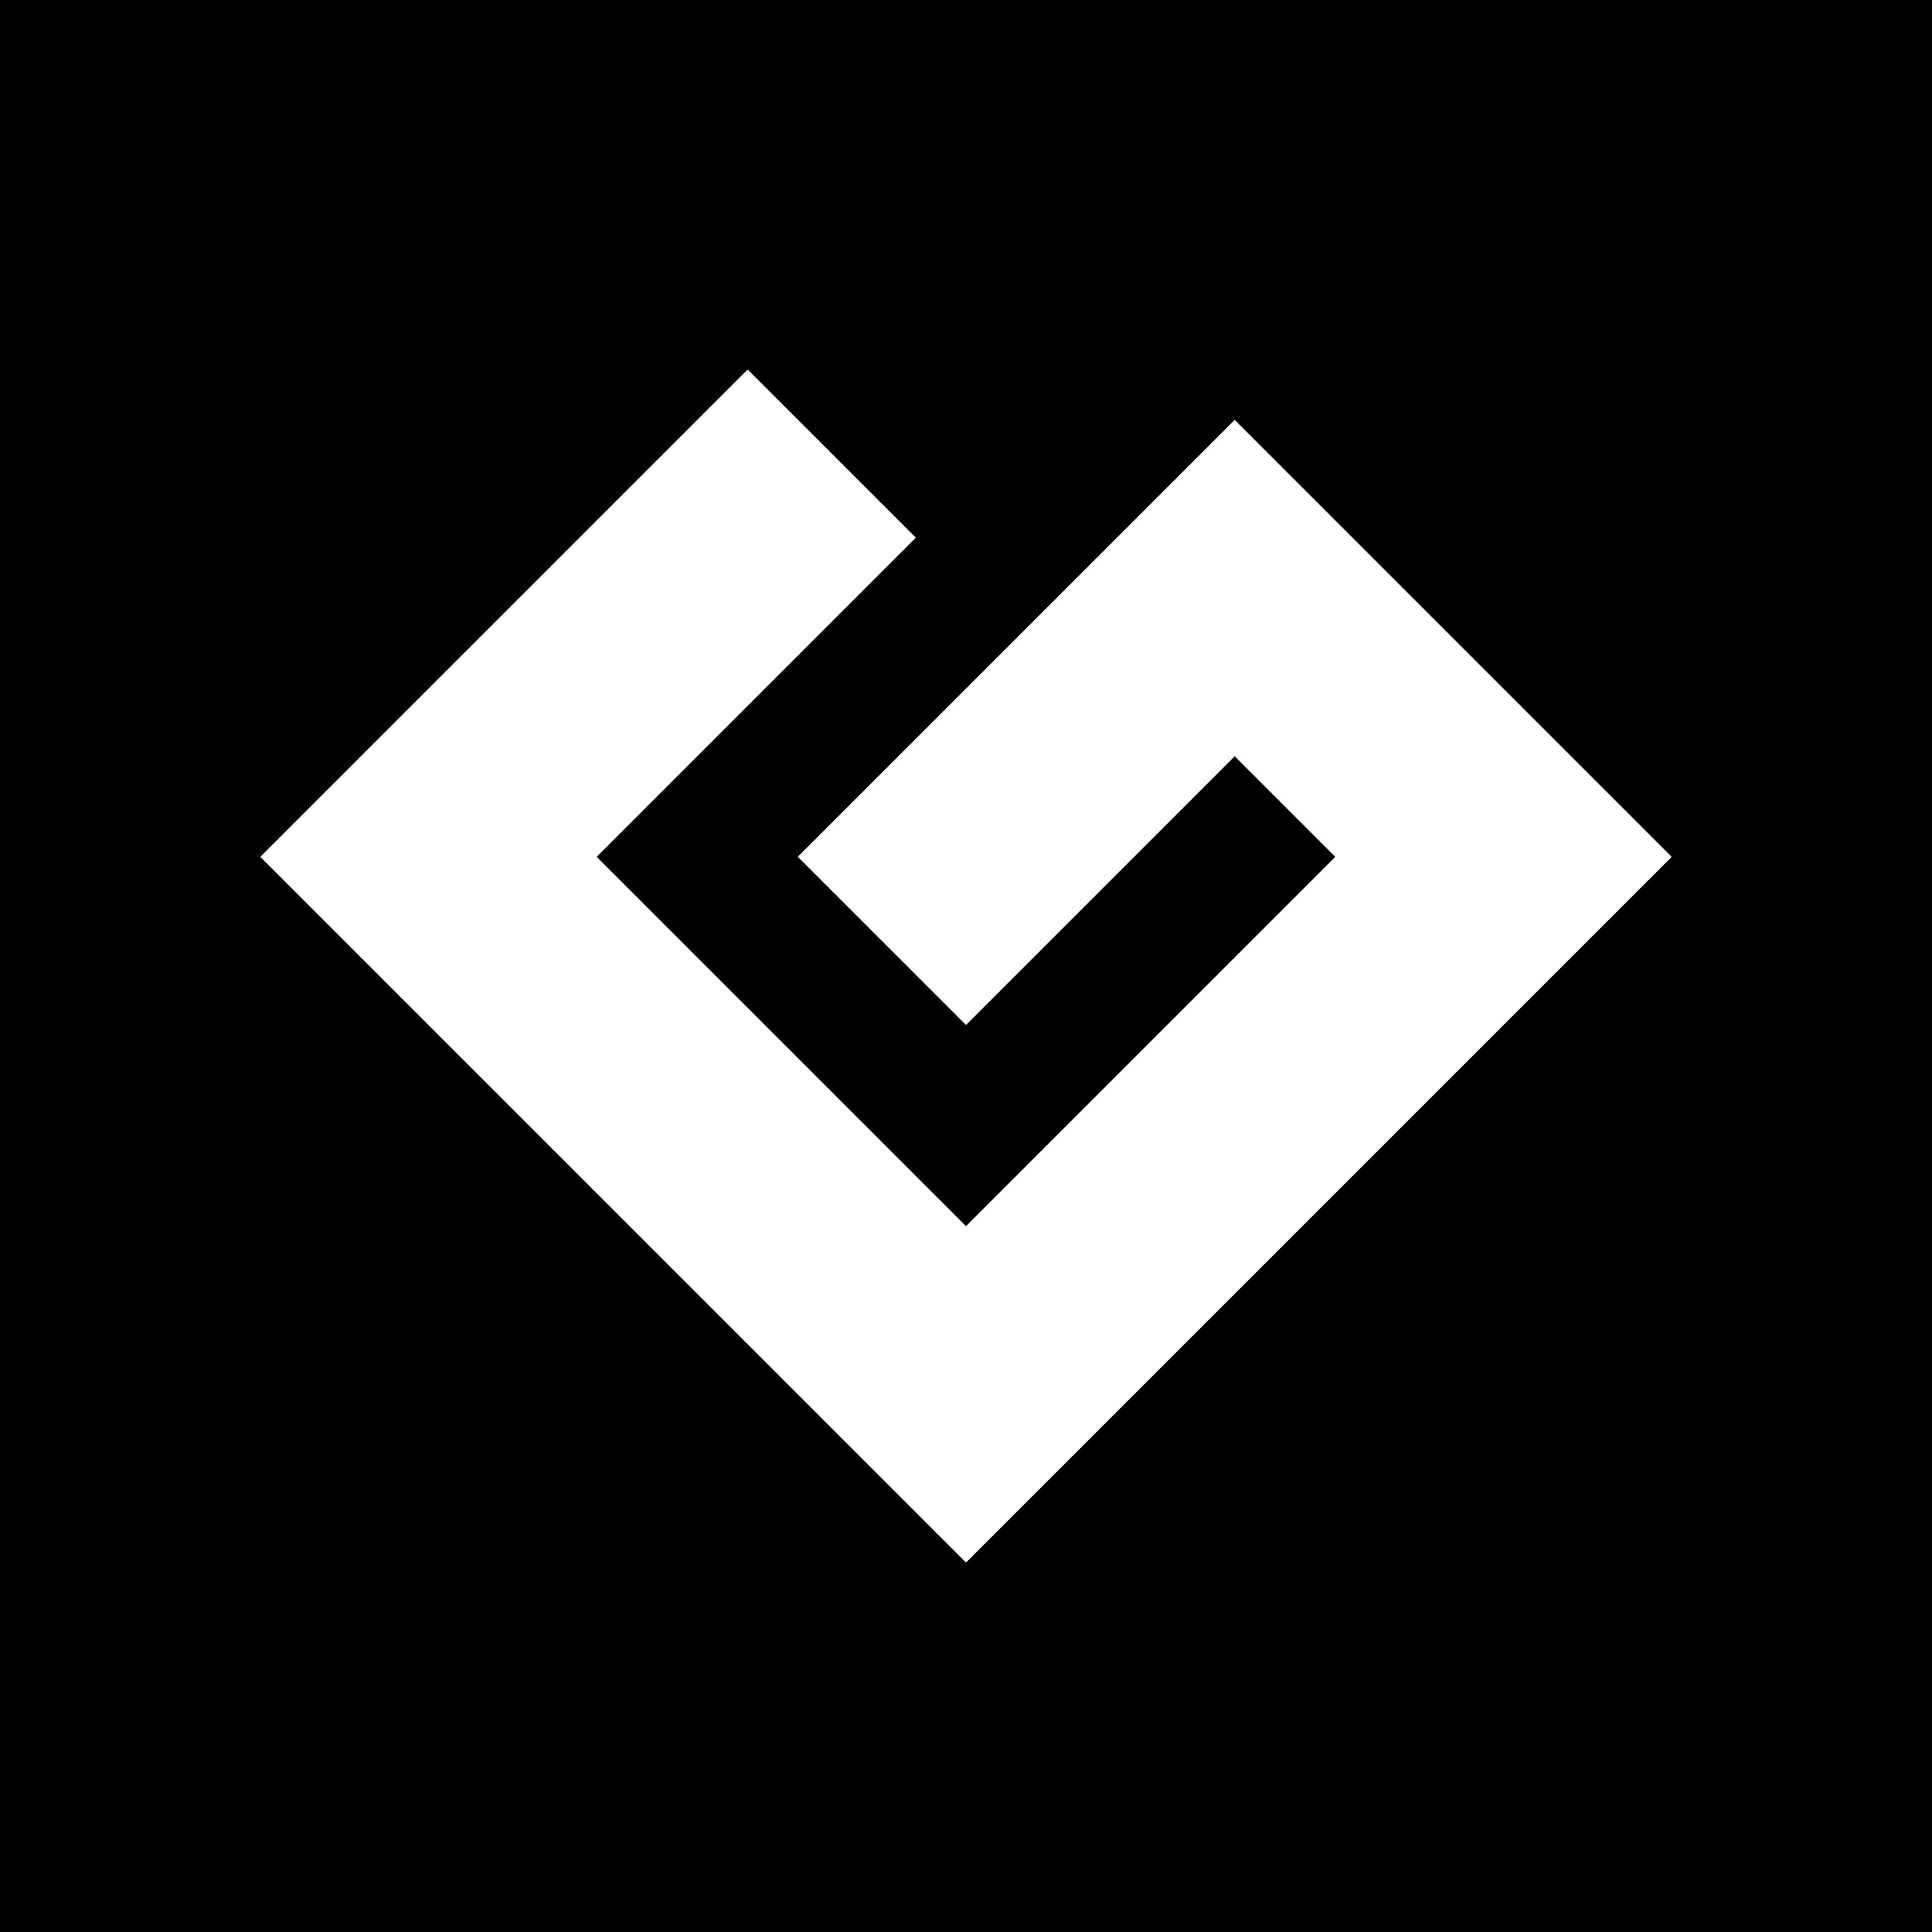 FitPal app下载-FitPal v1.6.0安卓版